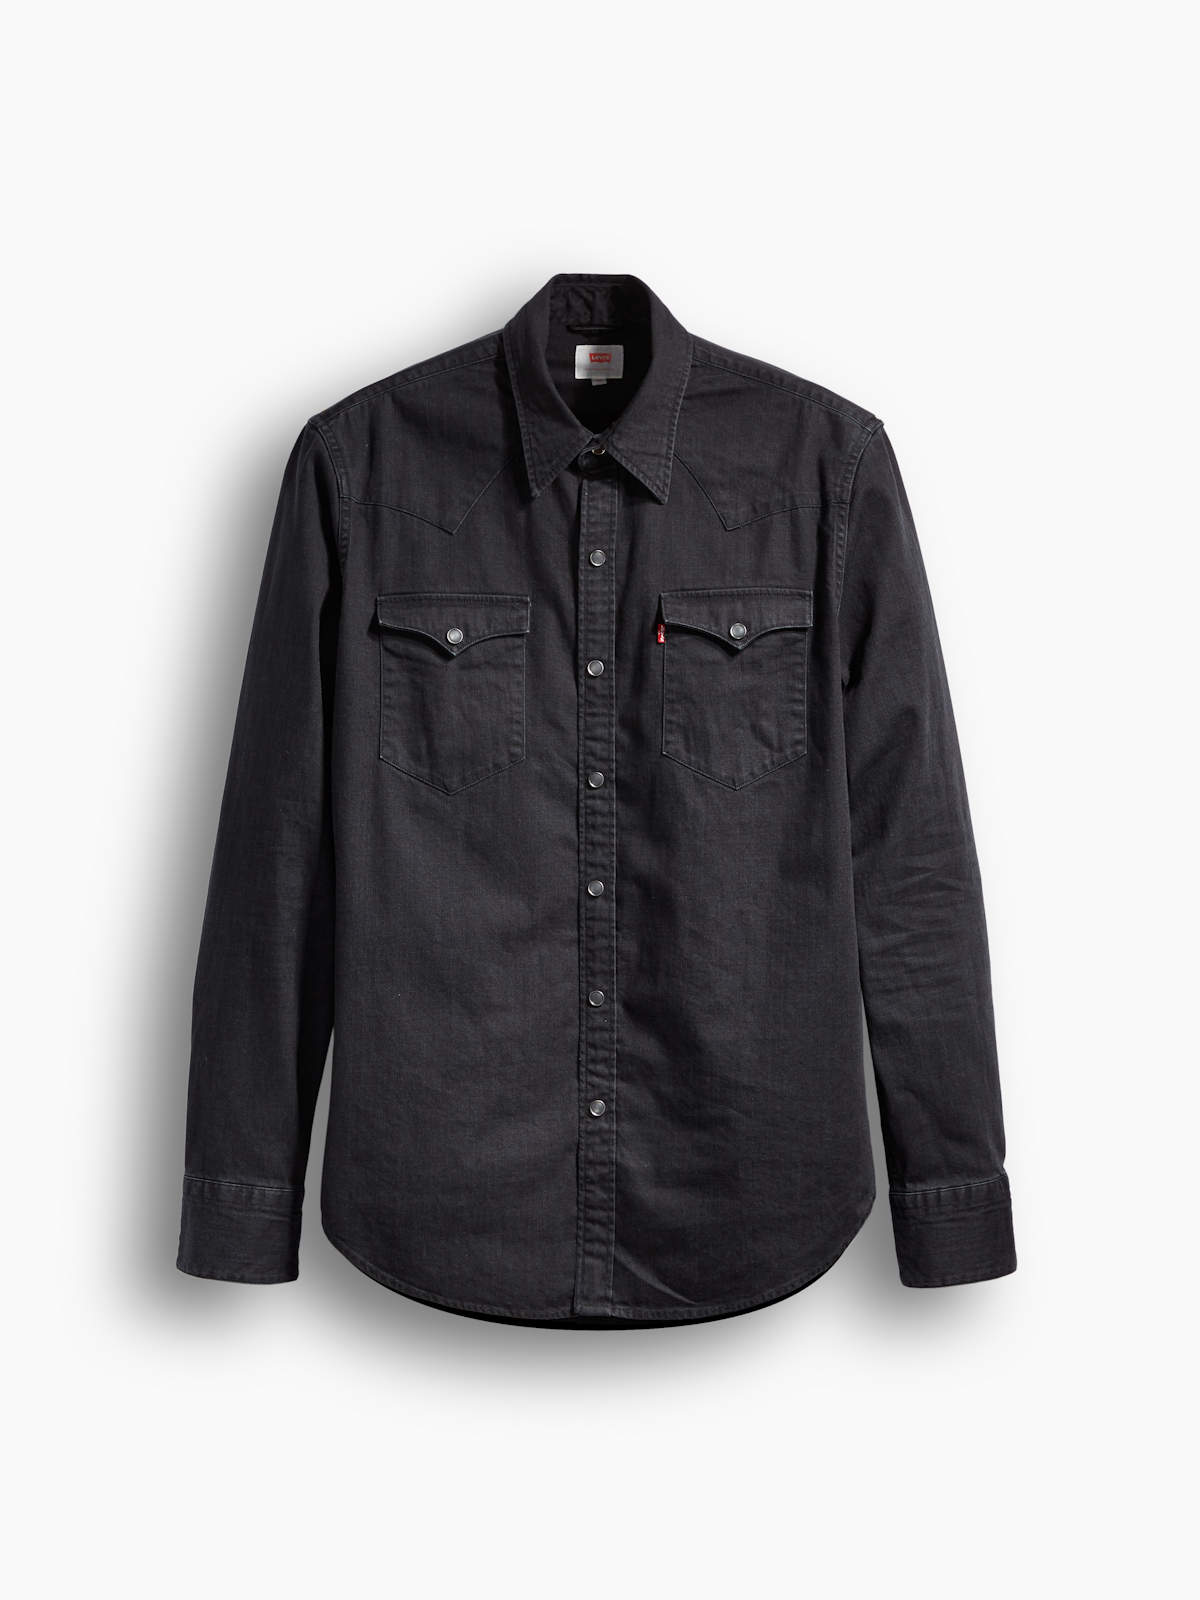 Denim Jeans Herren Hemd 0216 Western ® Barstow Black 65816 Levis xg1B0qw